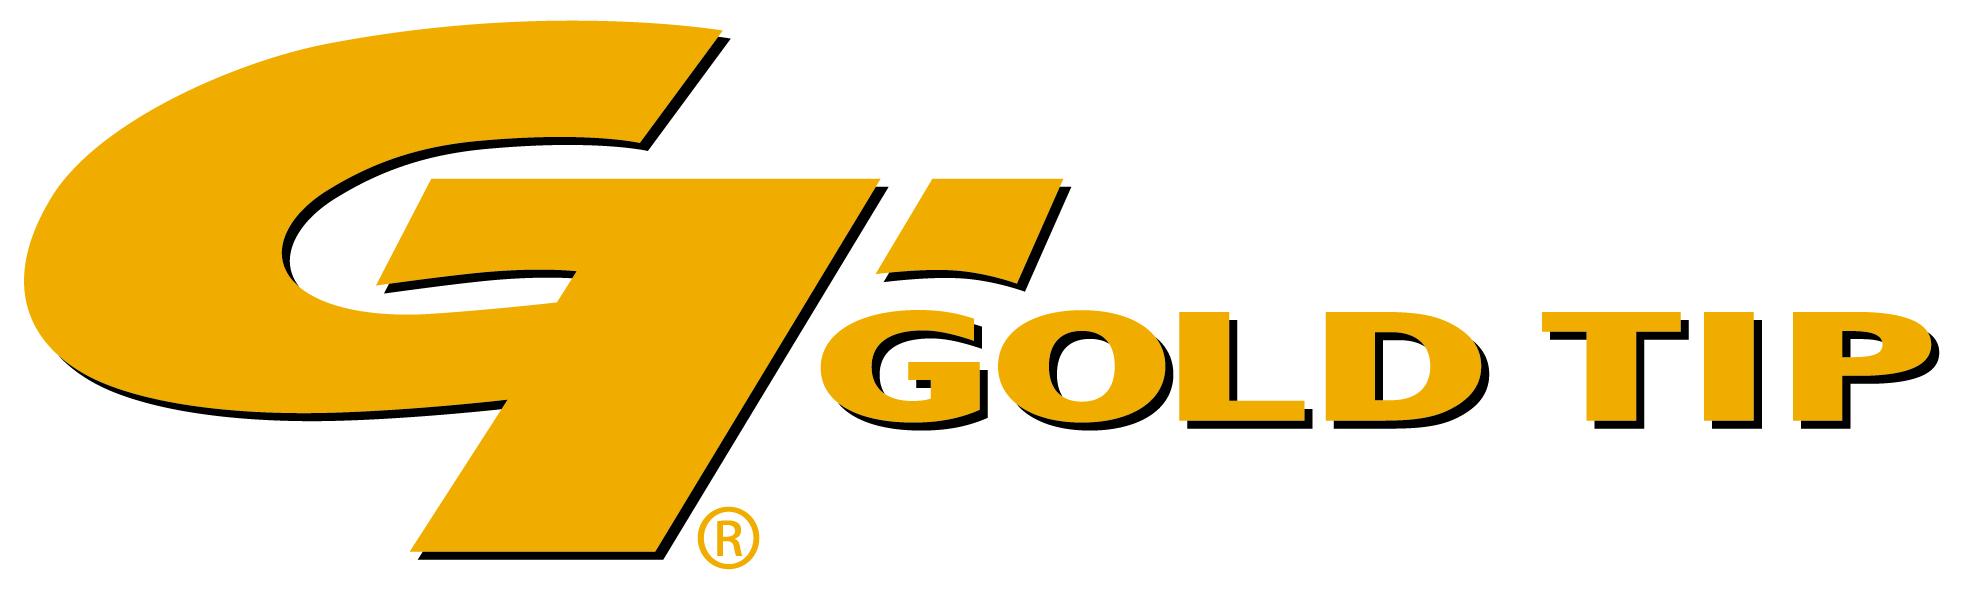 Gold Tip Arhcery thumbnail